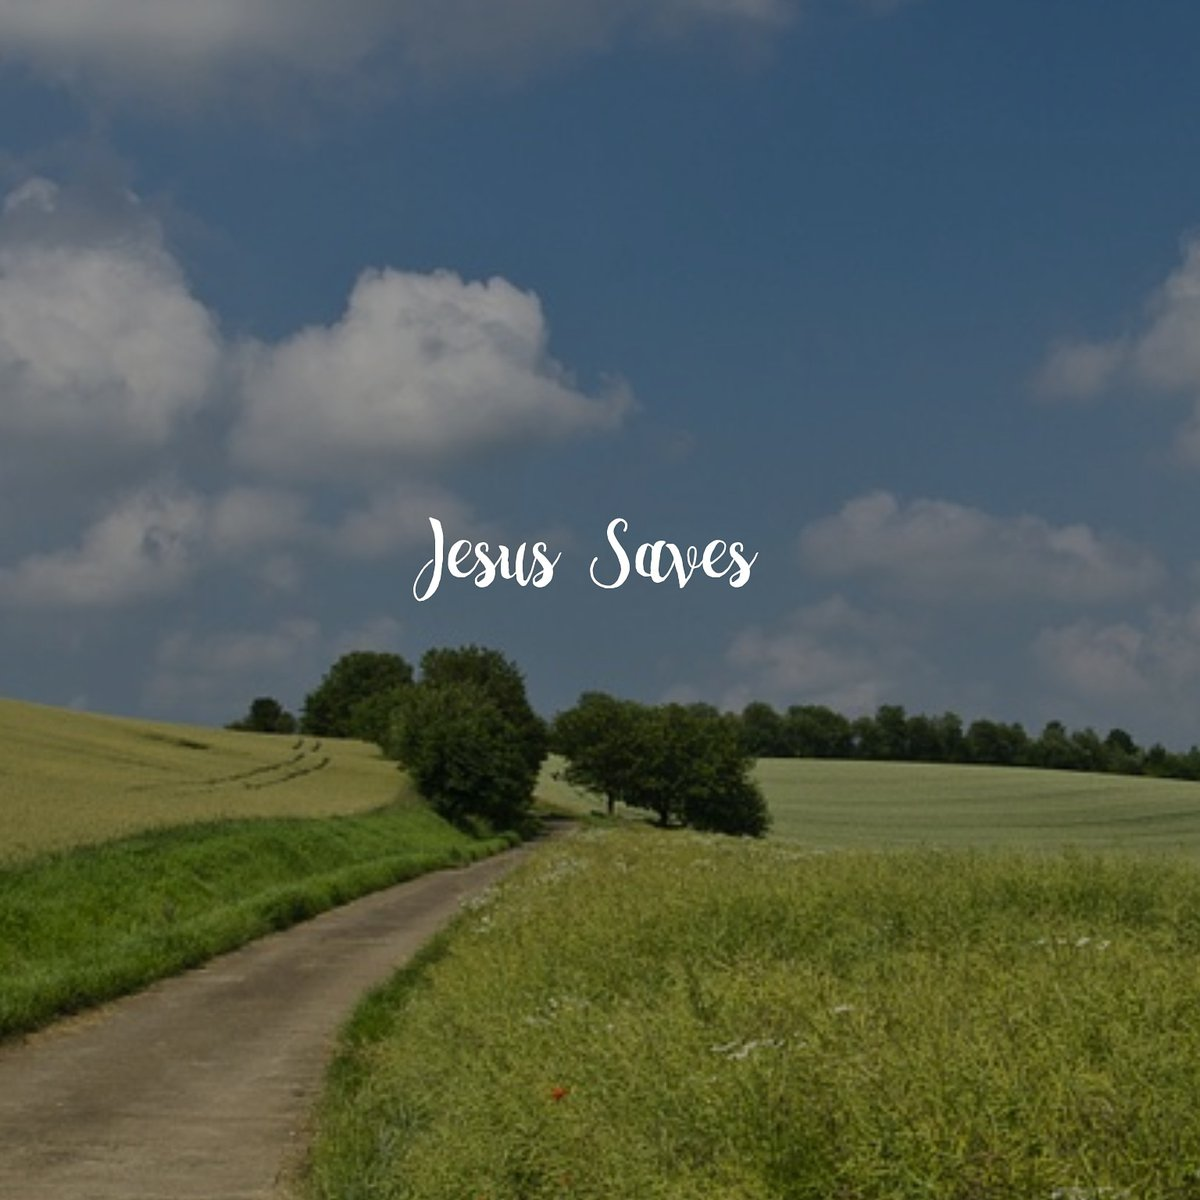 #MondayThoughts #MondayMotivation #MondayMorning #Jesus